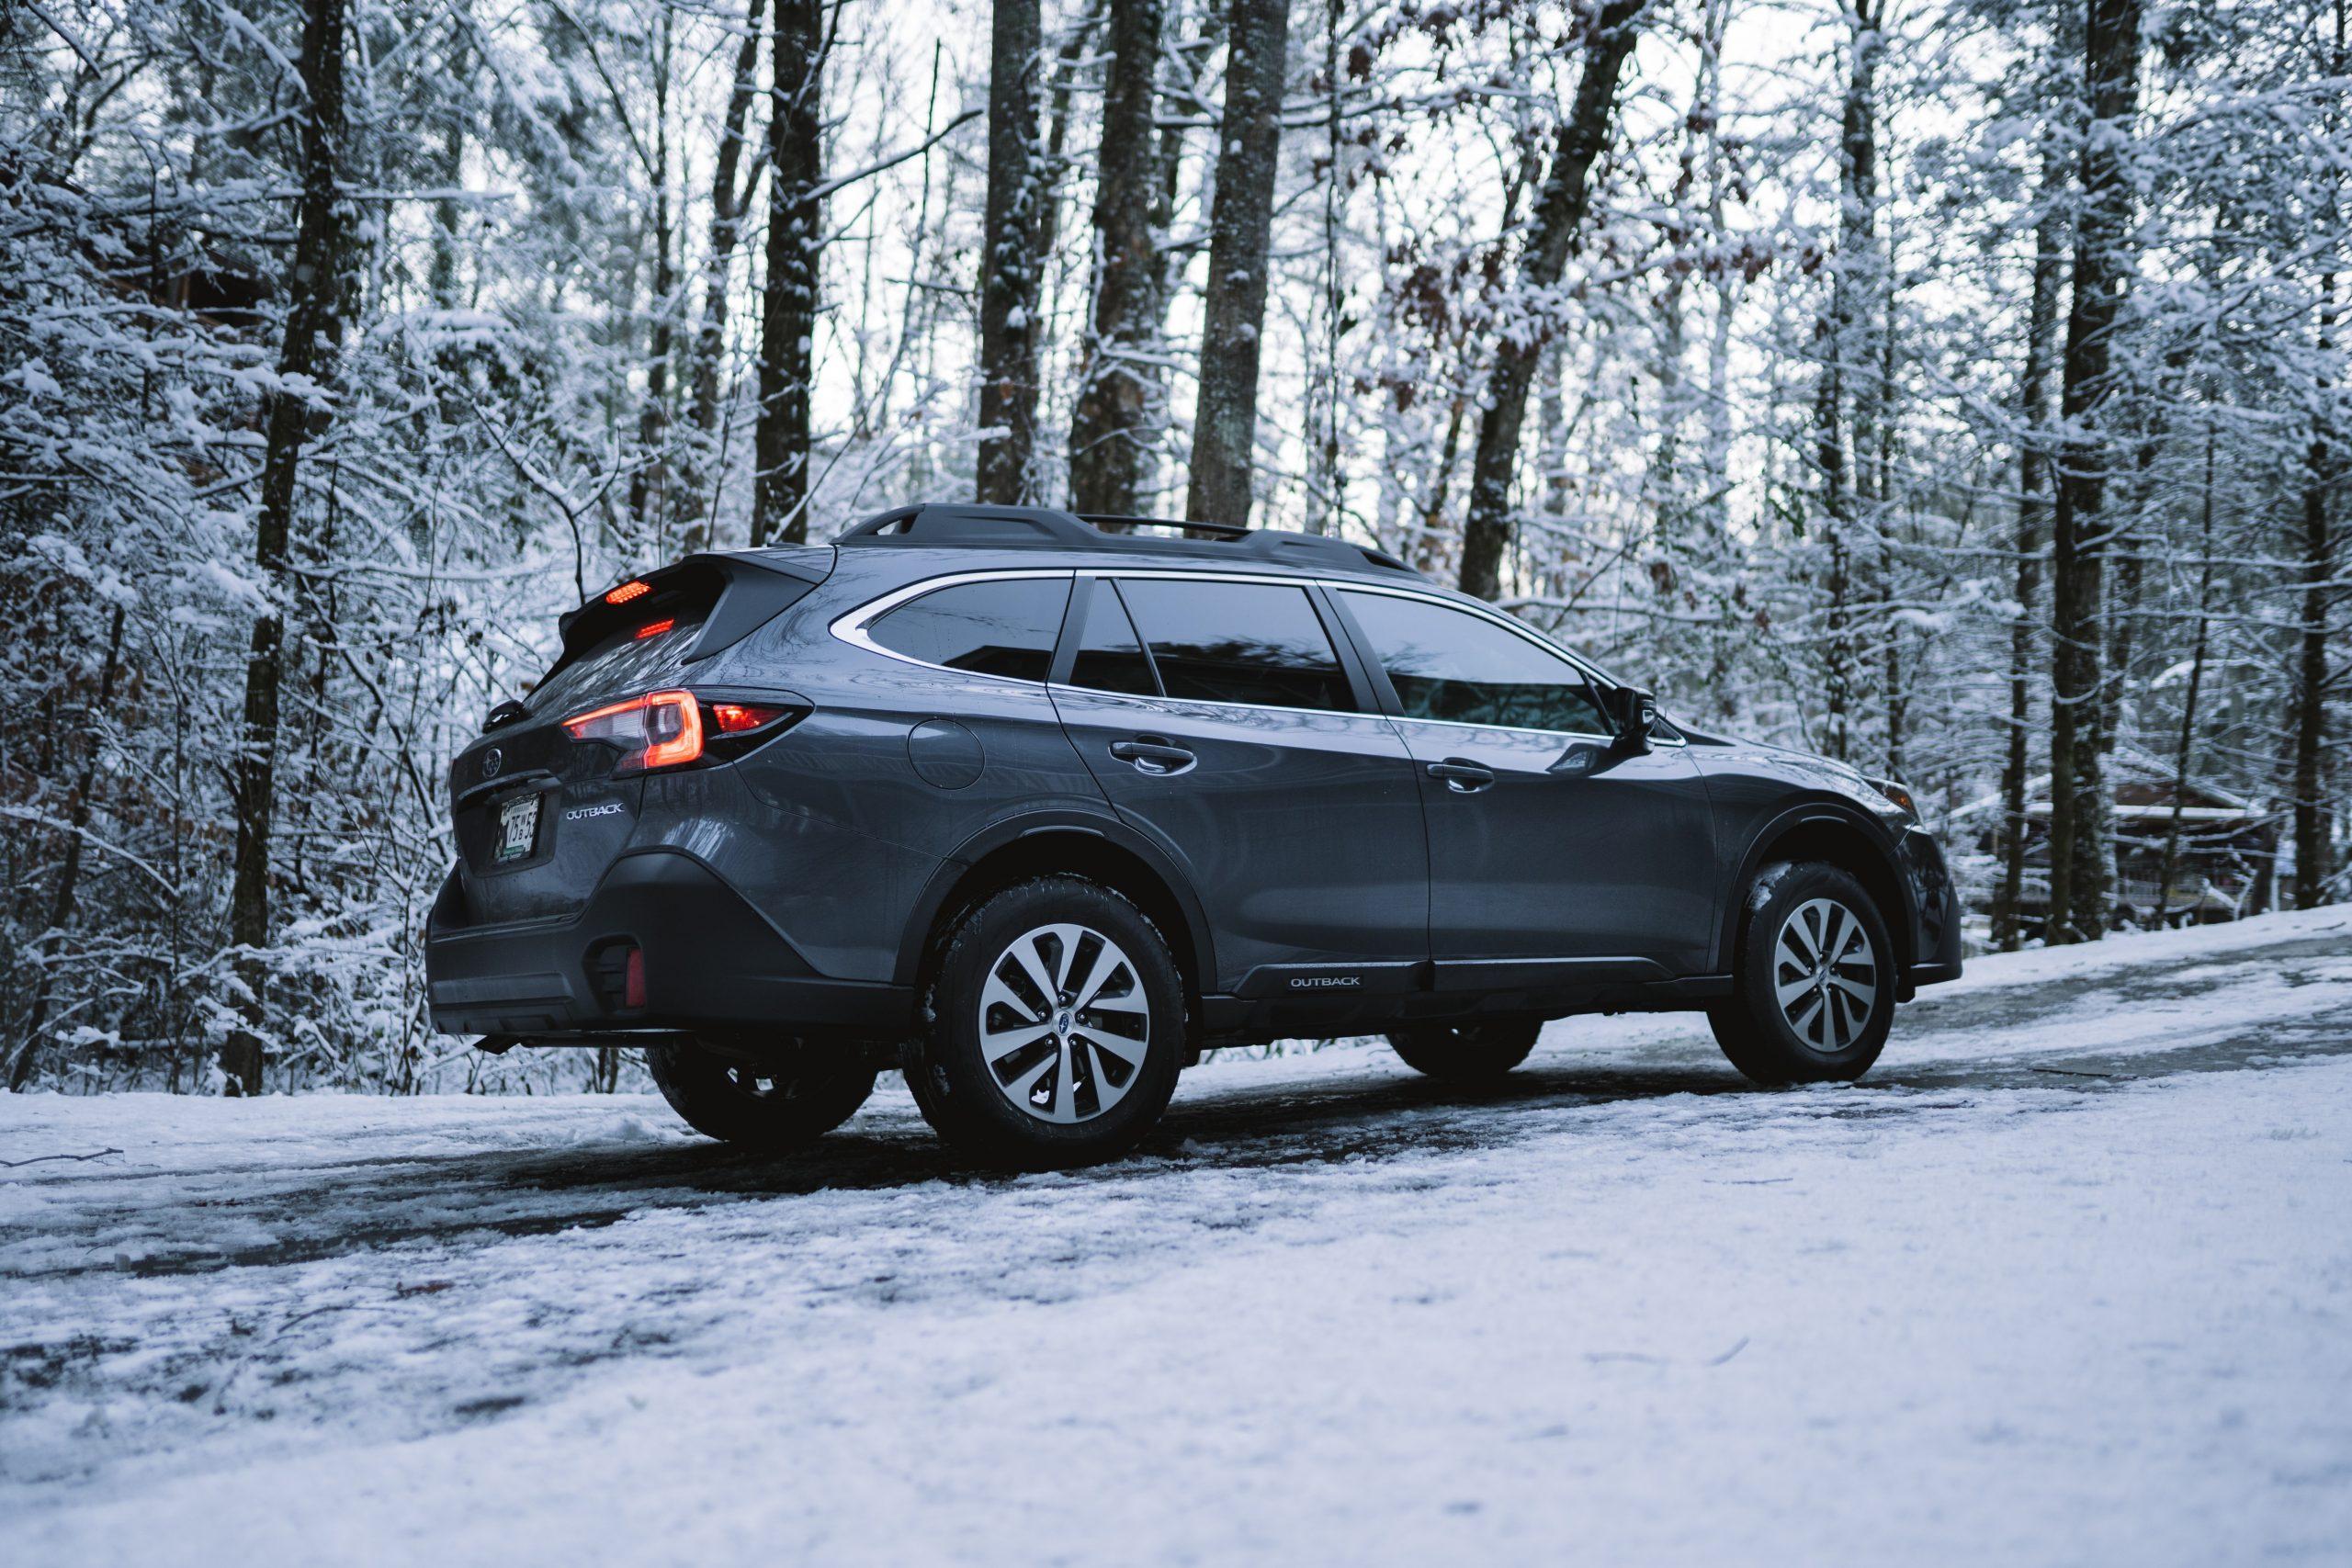 Subaru All Wheel Drive: What's the big deal?